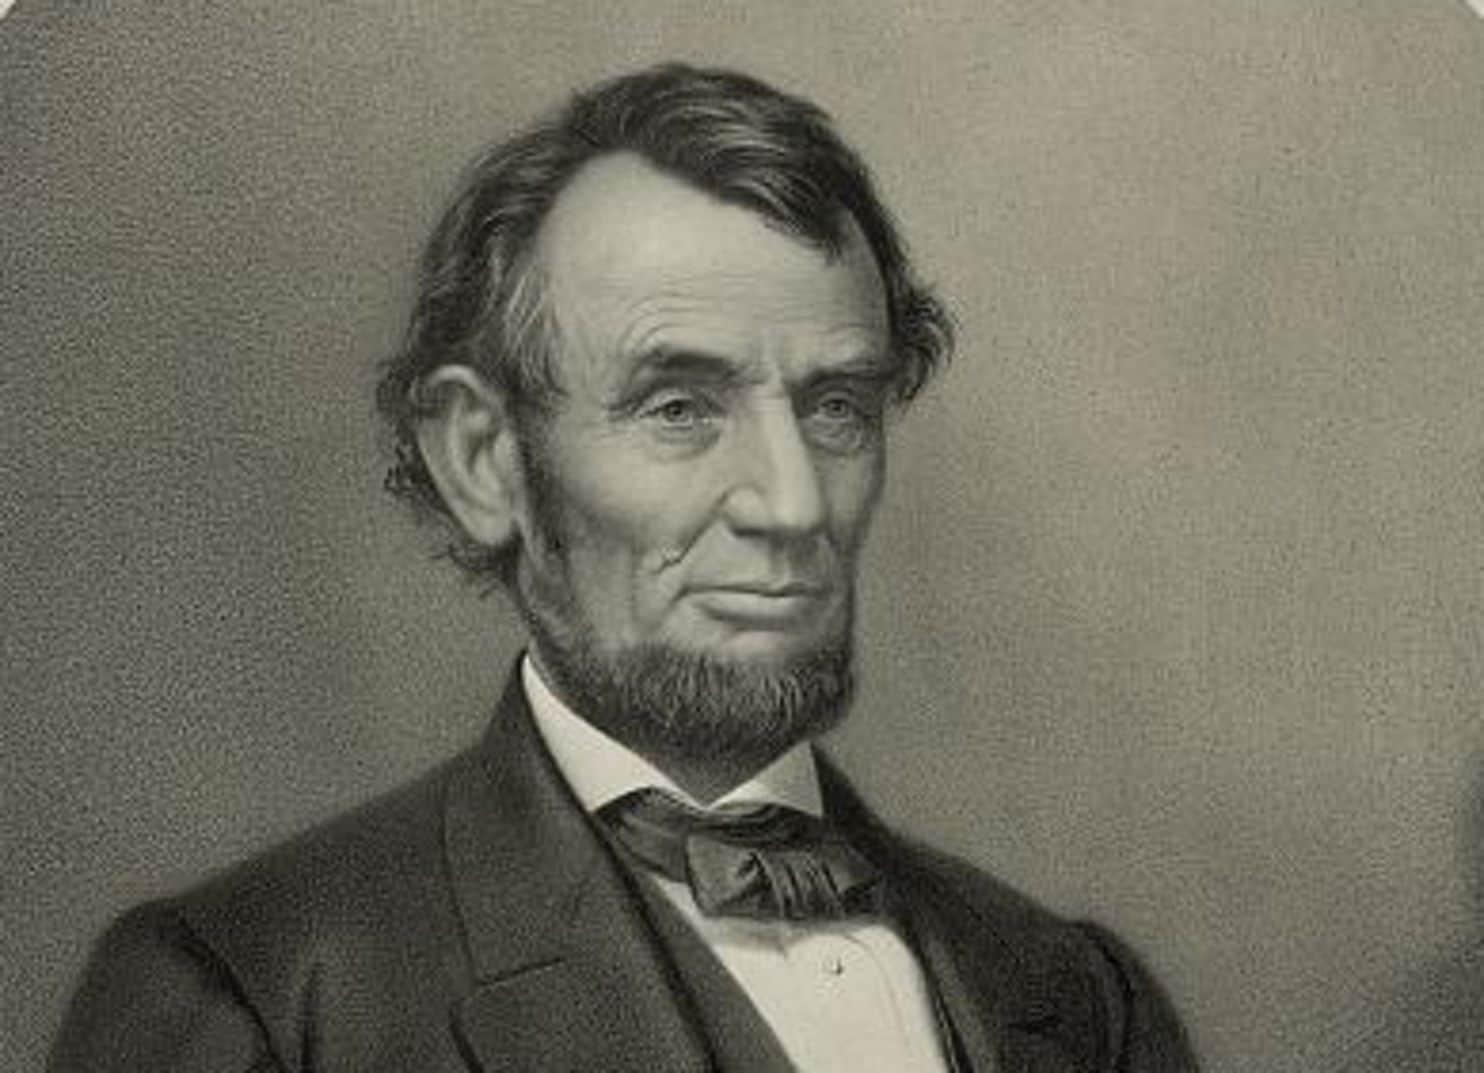 Abraham Linkoln, bivši predsjednik SAD-a,